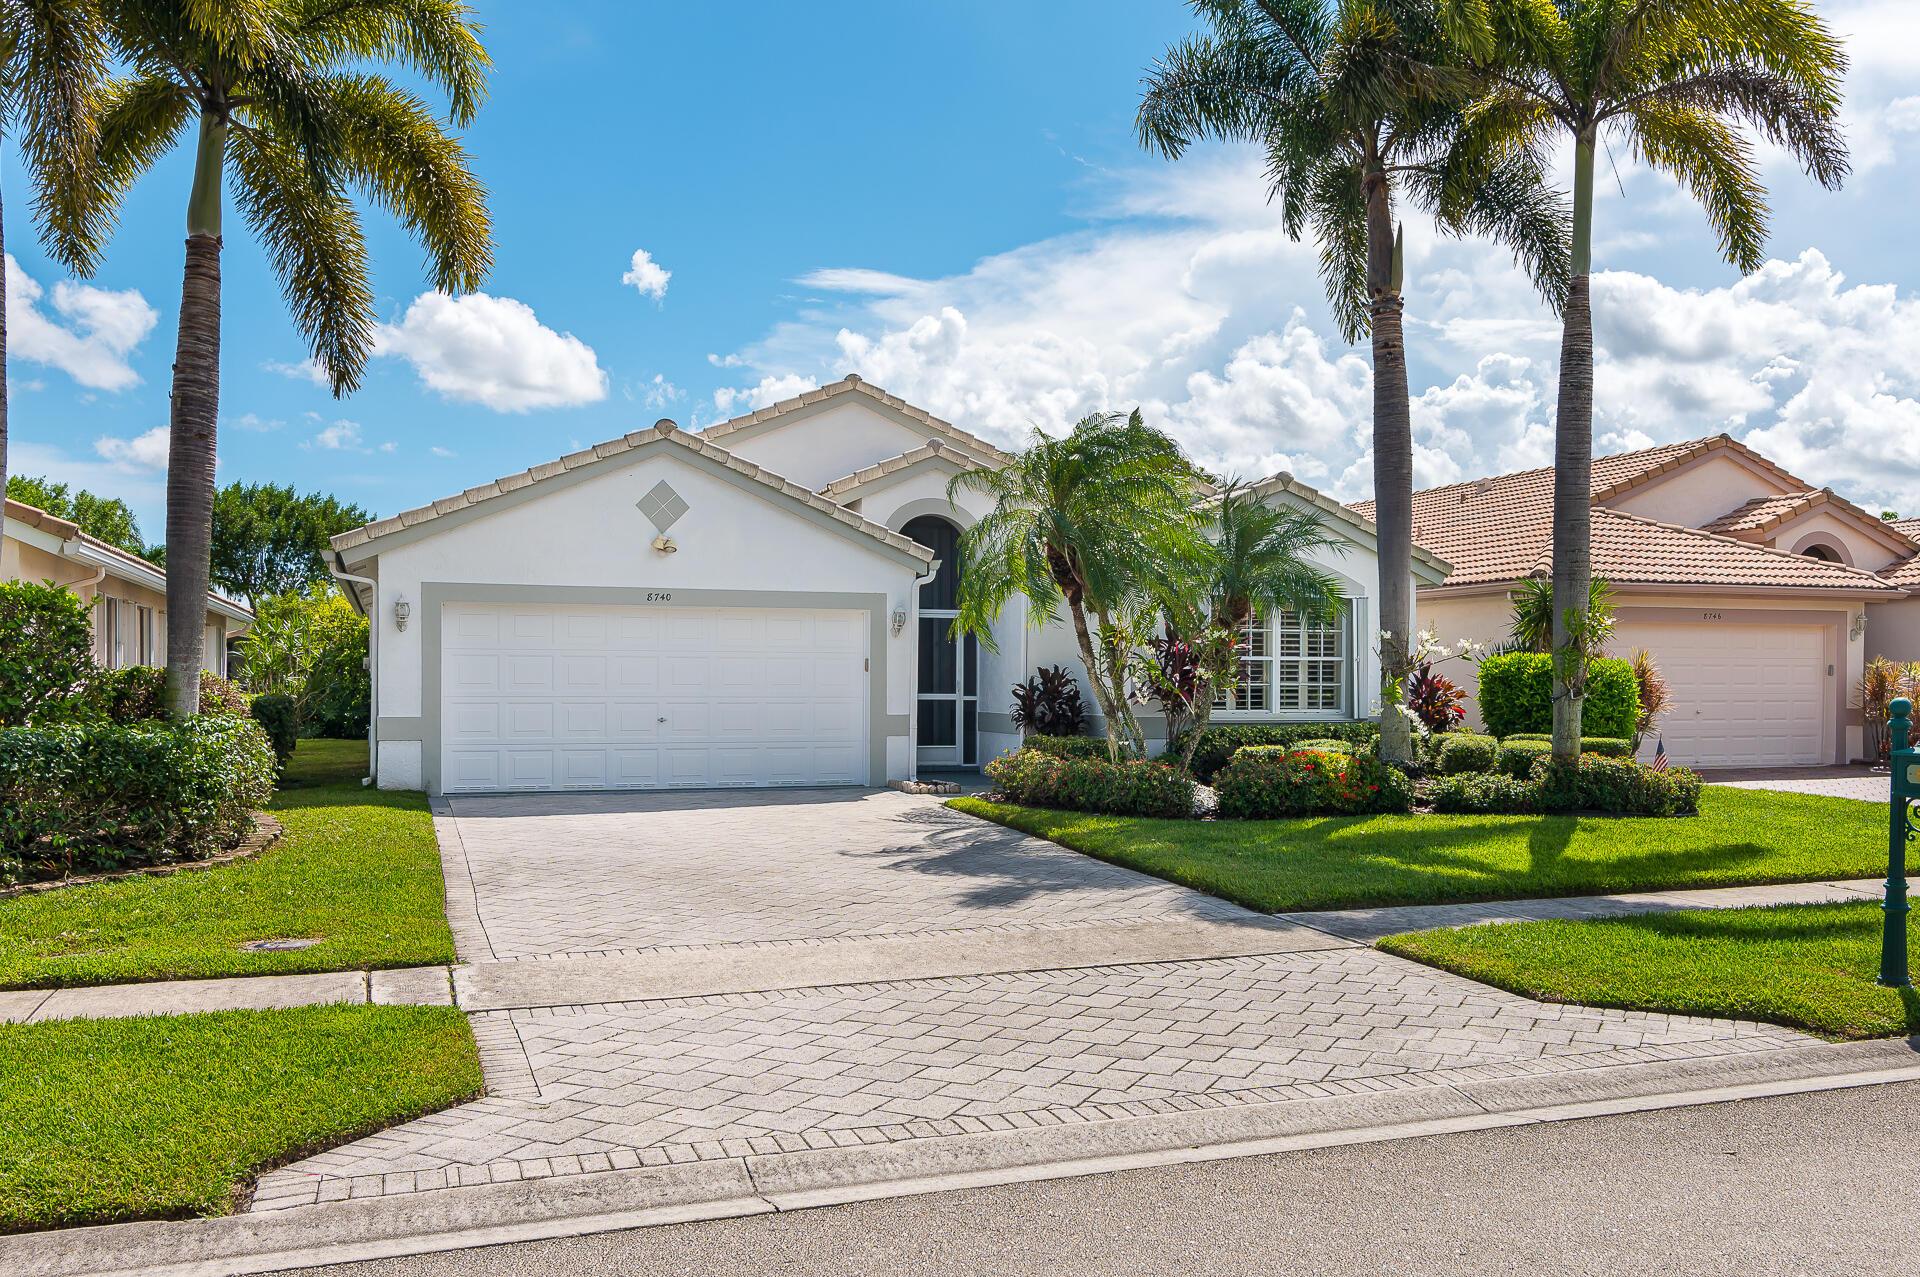 8740 Chunnel Terrace  Boca Raton, FL 33433